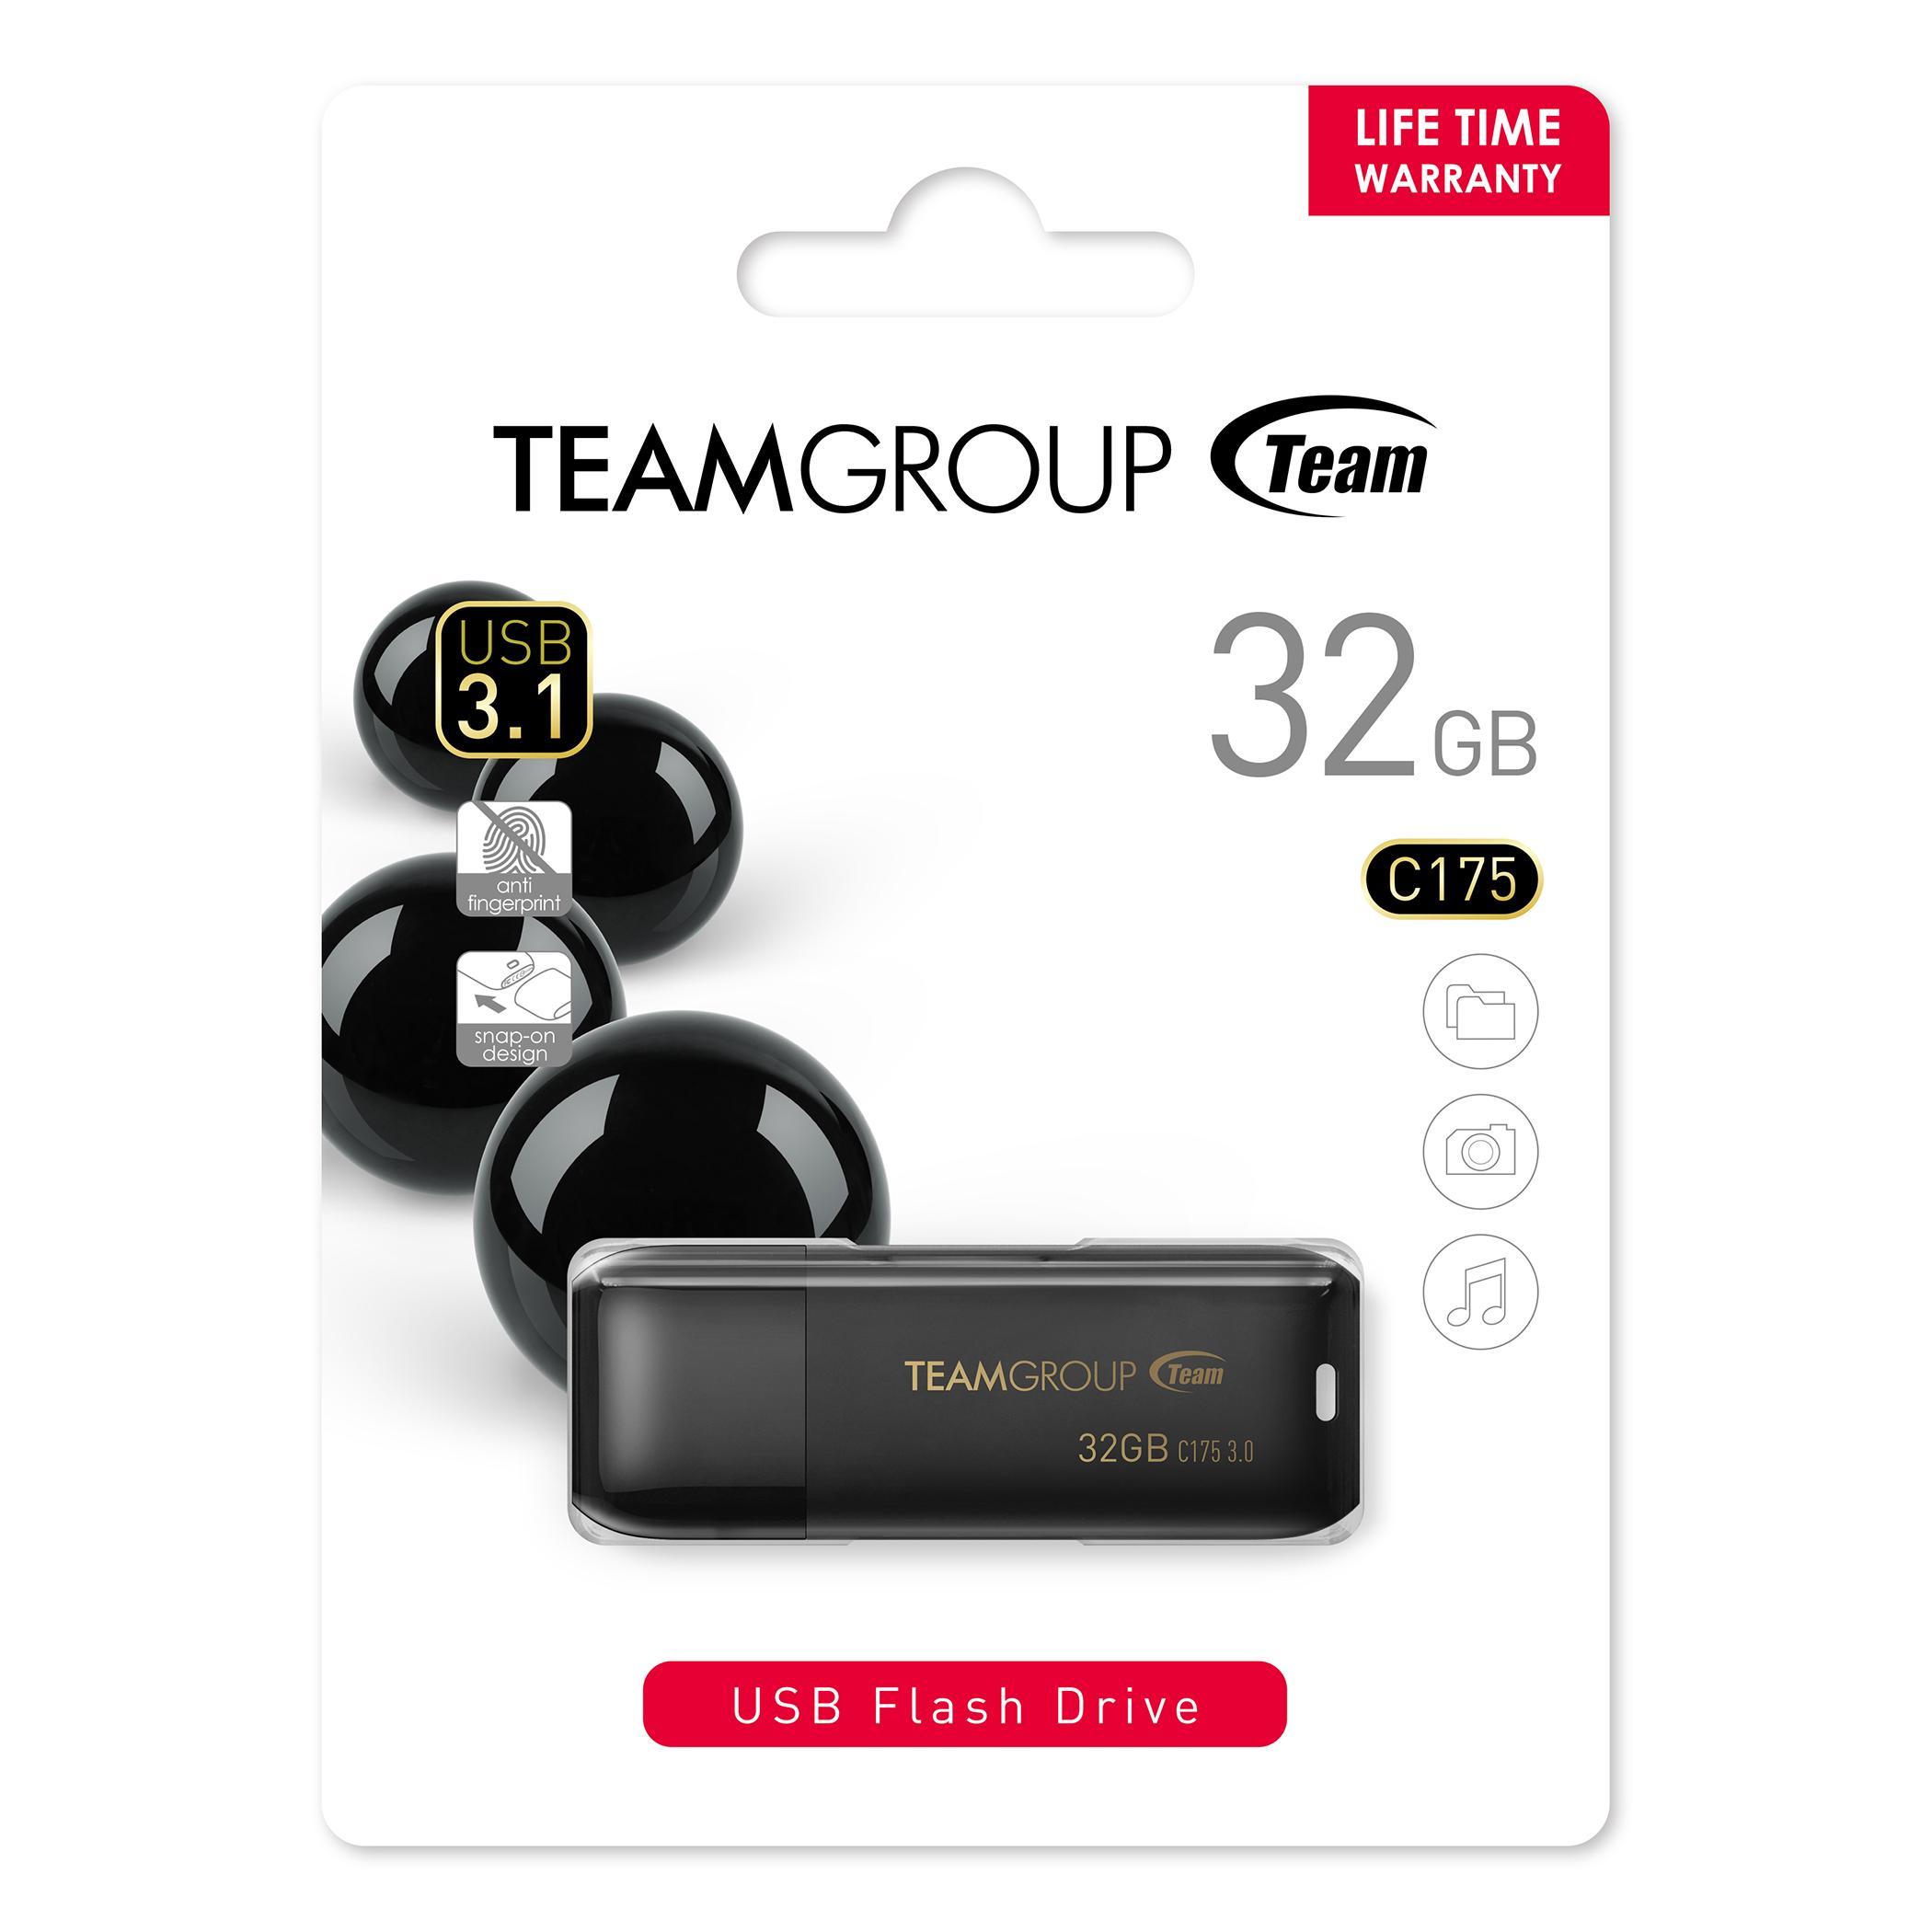 USB памет Team Group C175 32GB USB 3.1